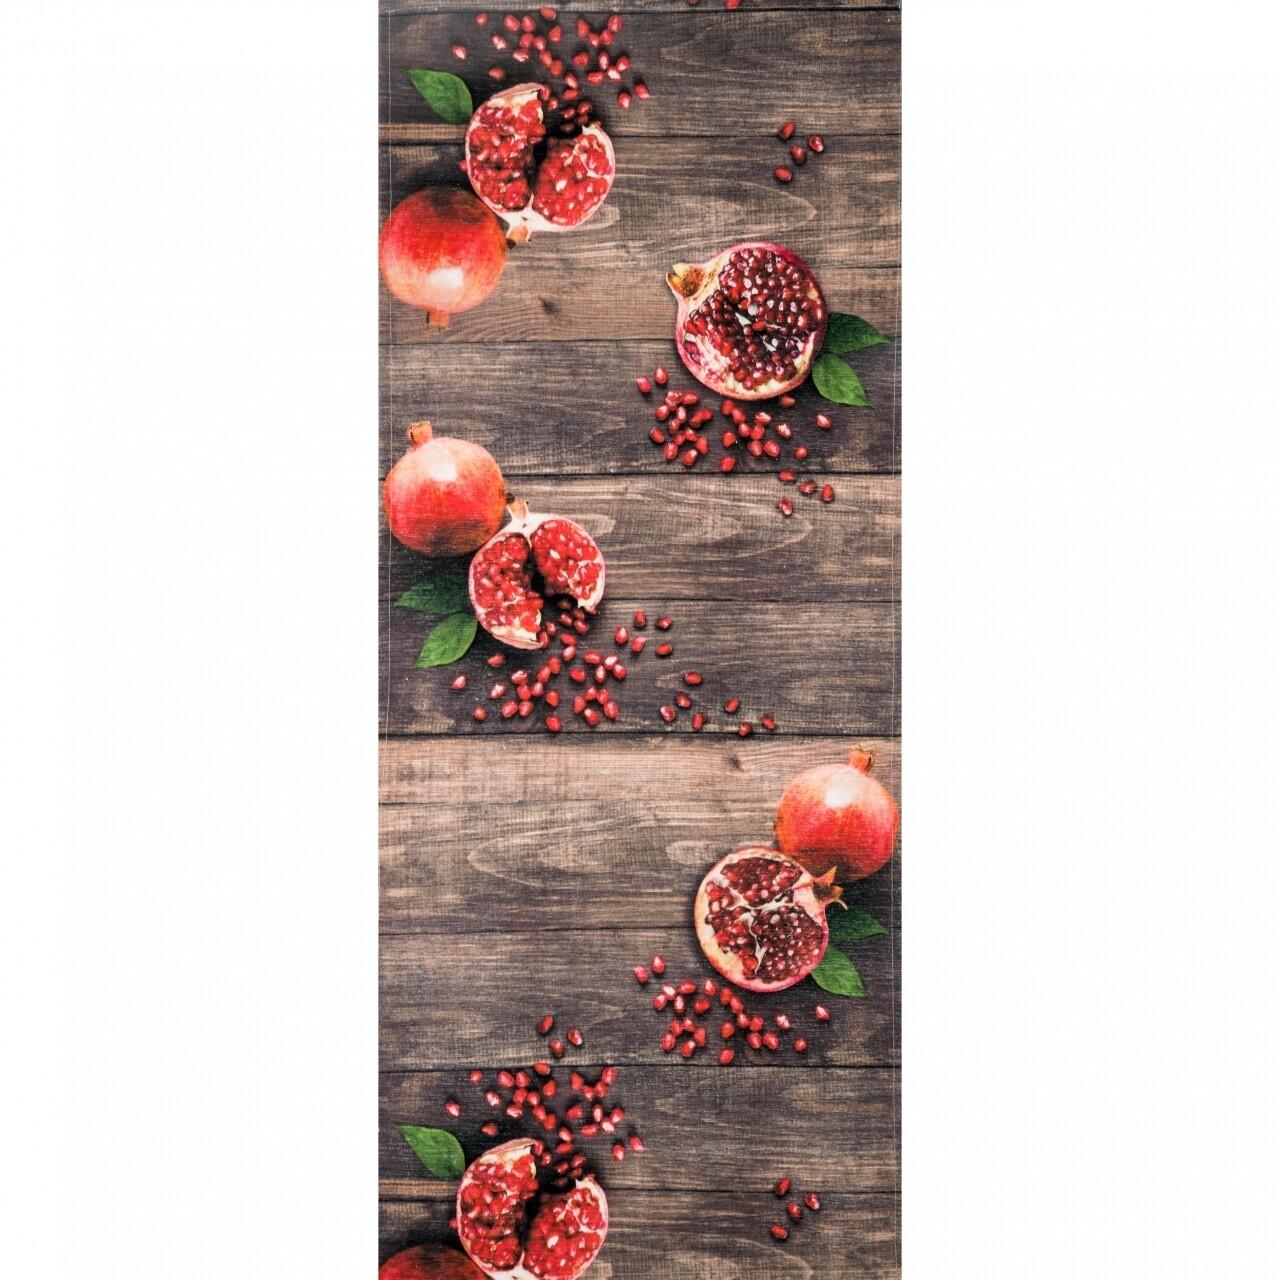 Covor rezistent Webtappeti MELOGRANA CM 58x115 cm, maro/rosu/verde